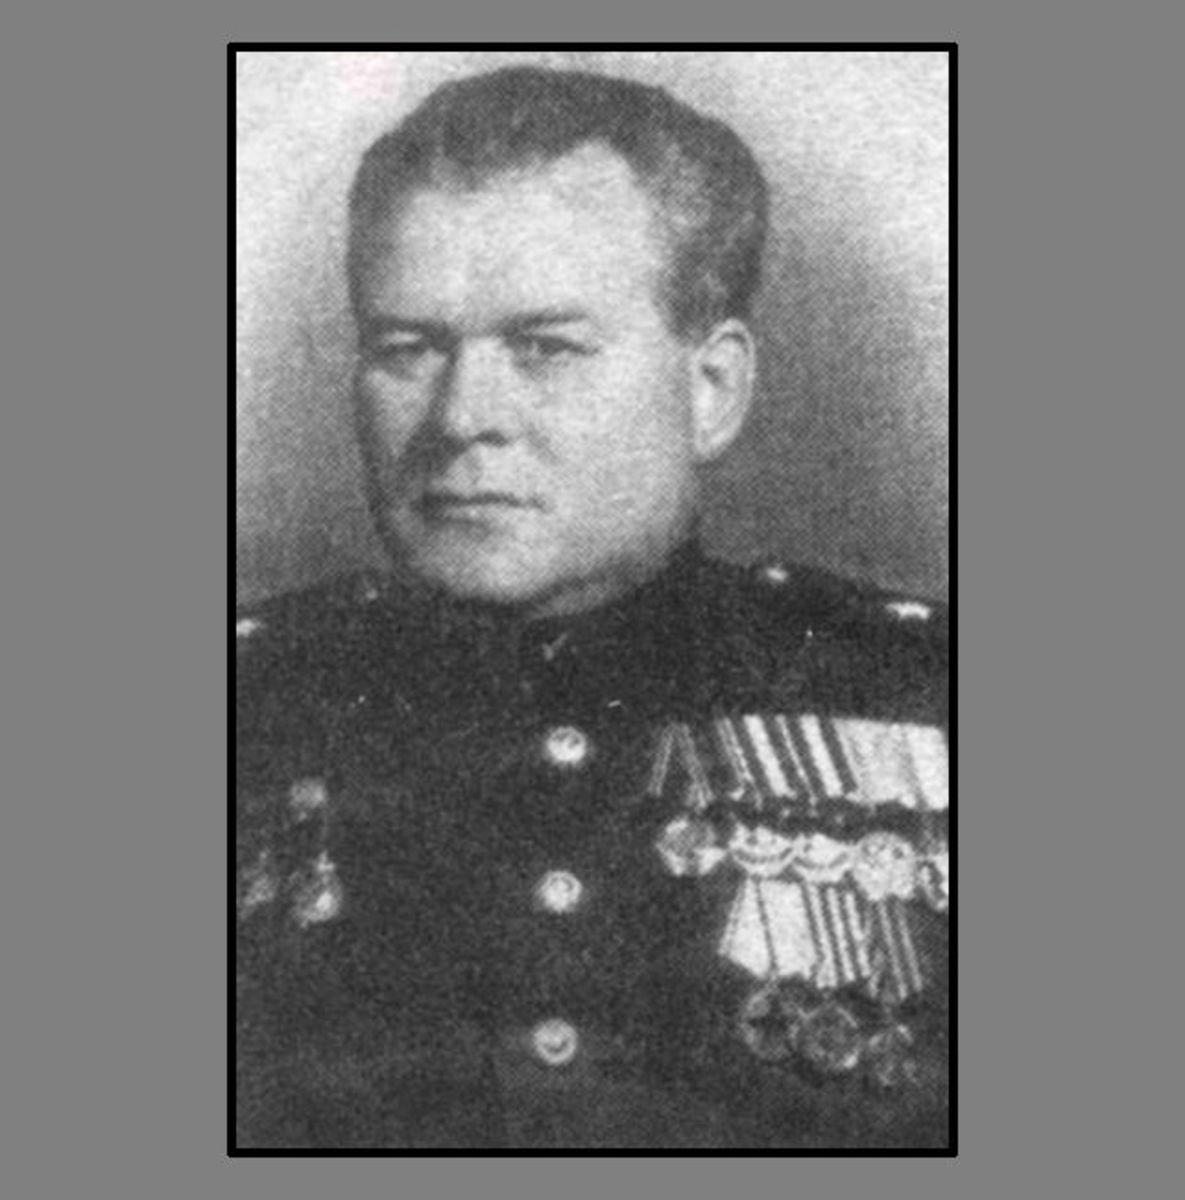 World War Two: Major-General Vasili Blokhin. Stalin's chief executioner. 1926.